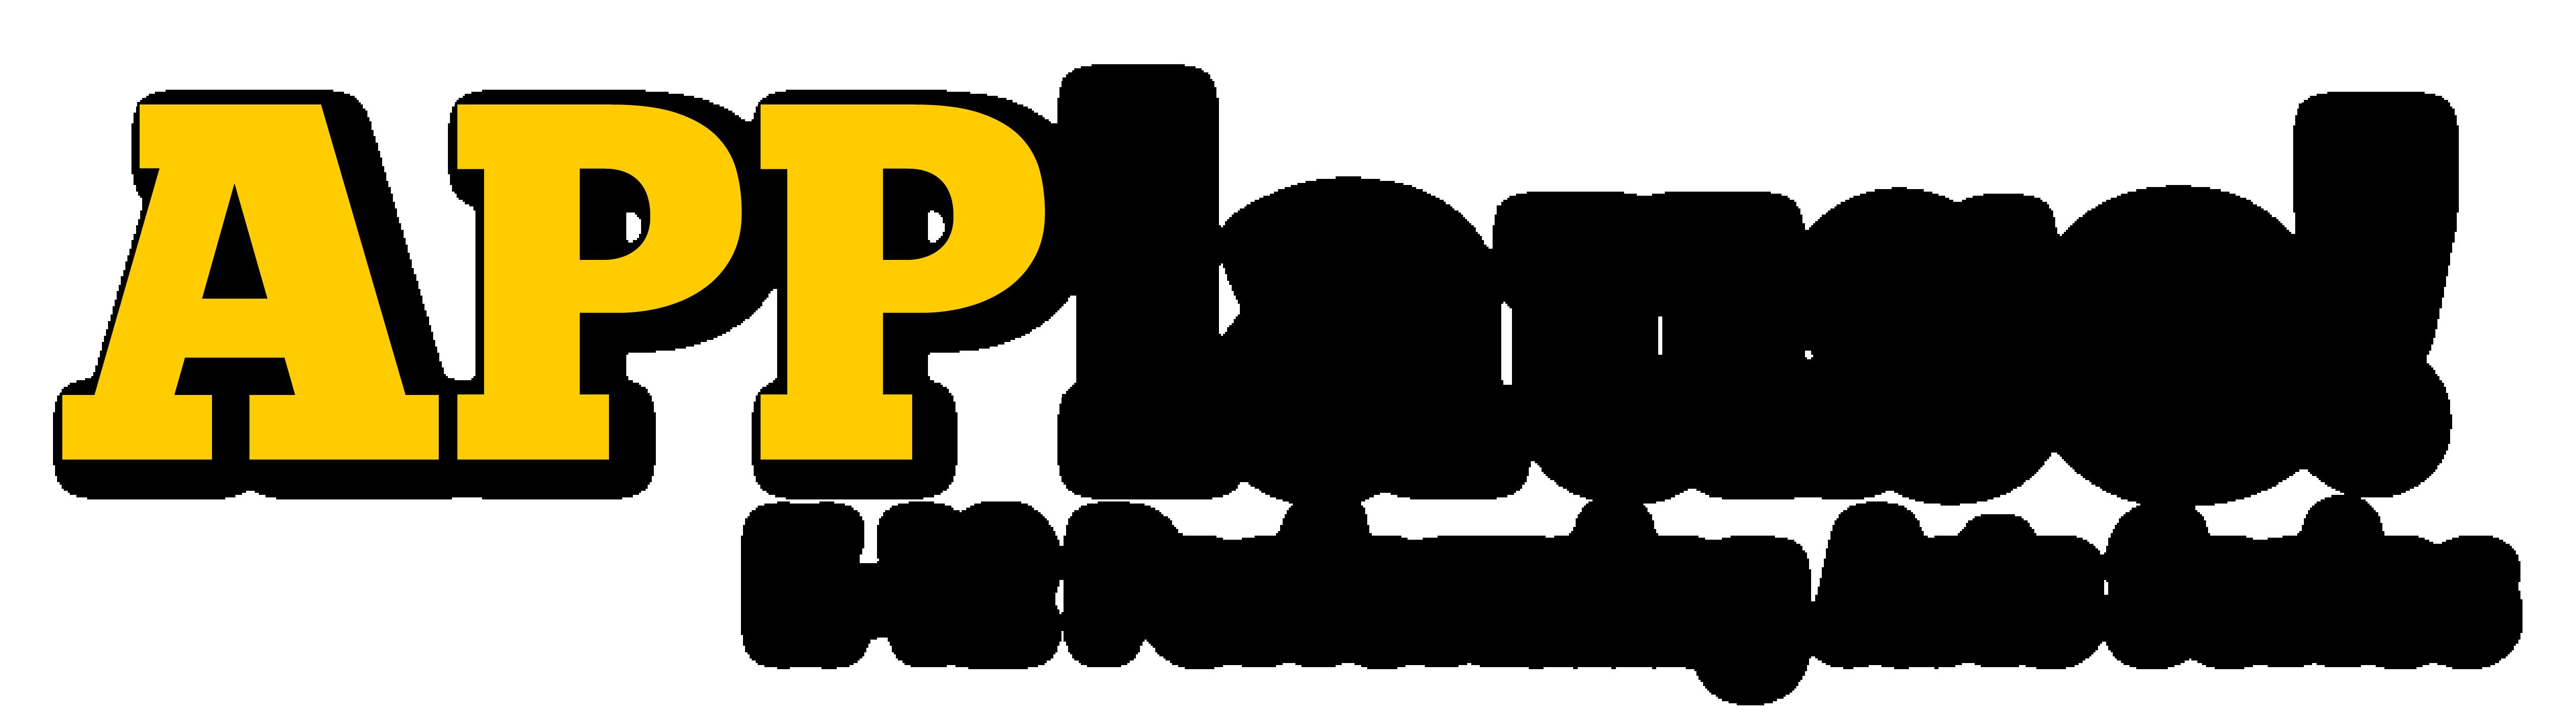 applause logo